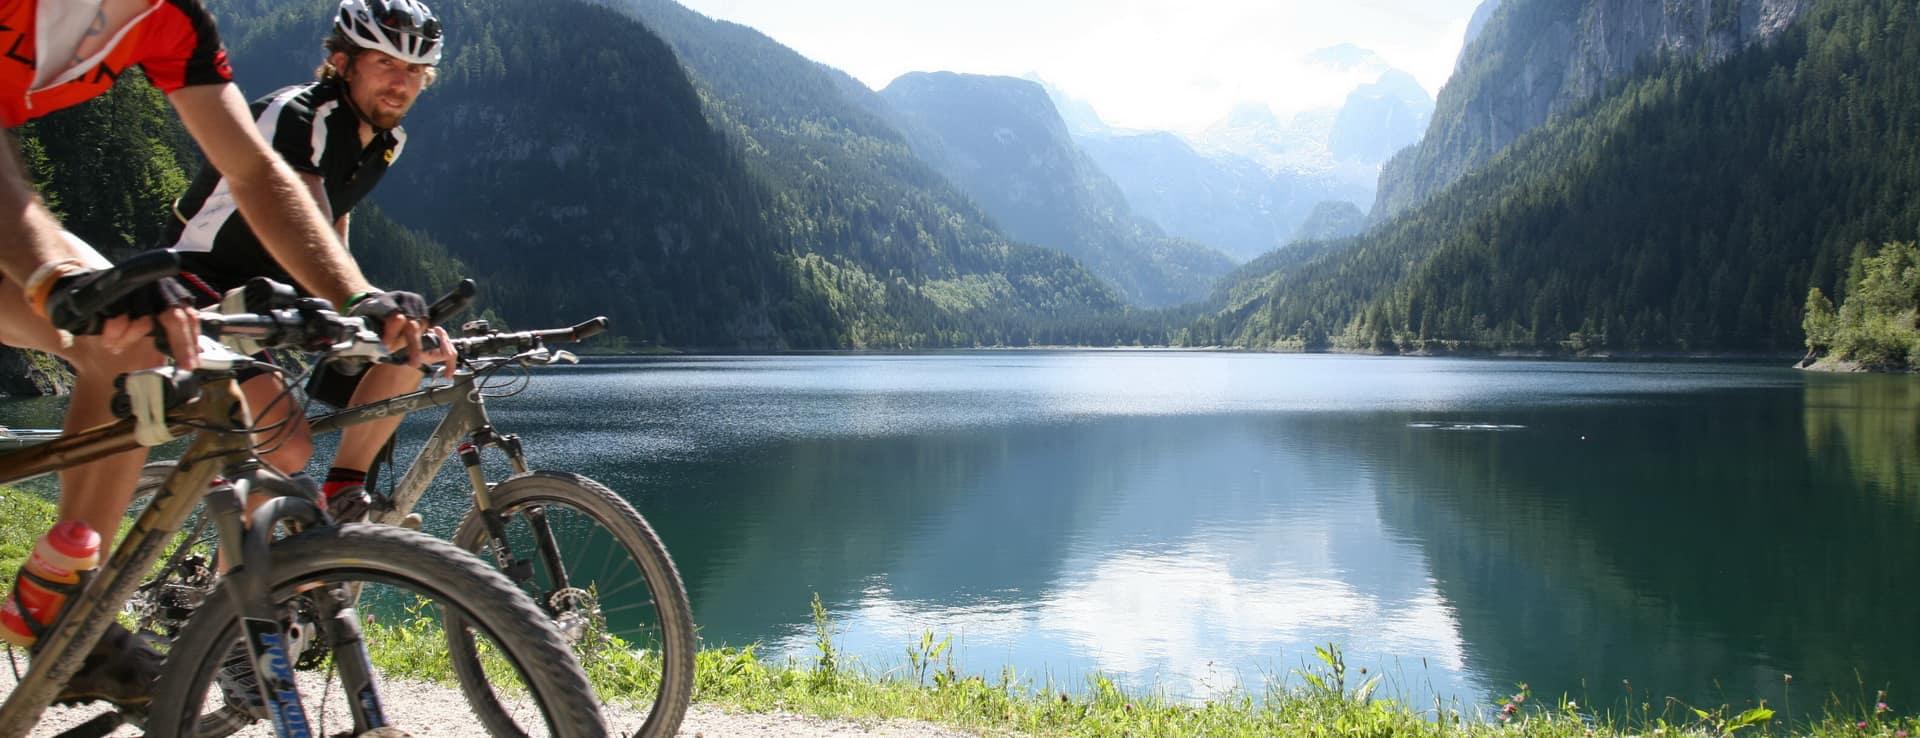 Gosausjön och Dachstein Österrike